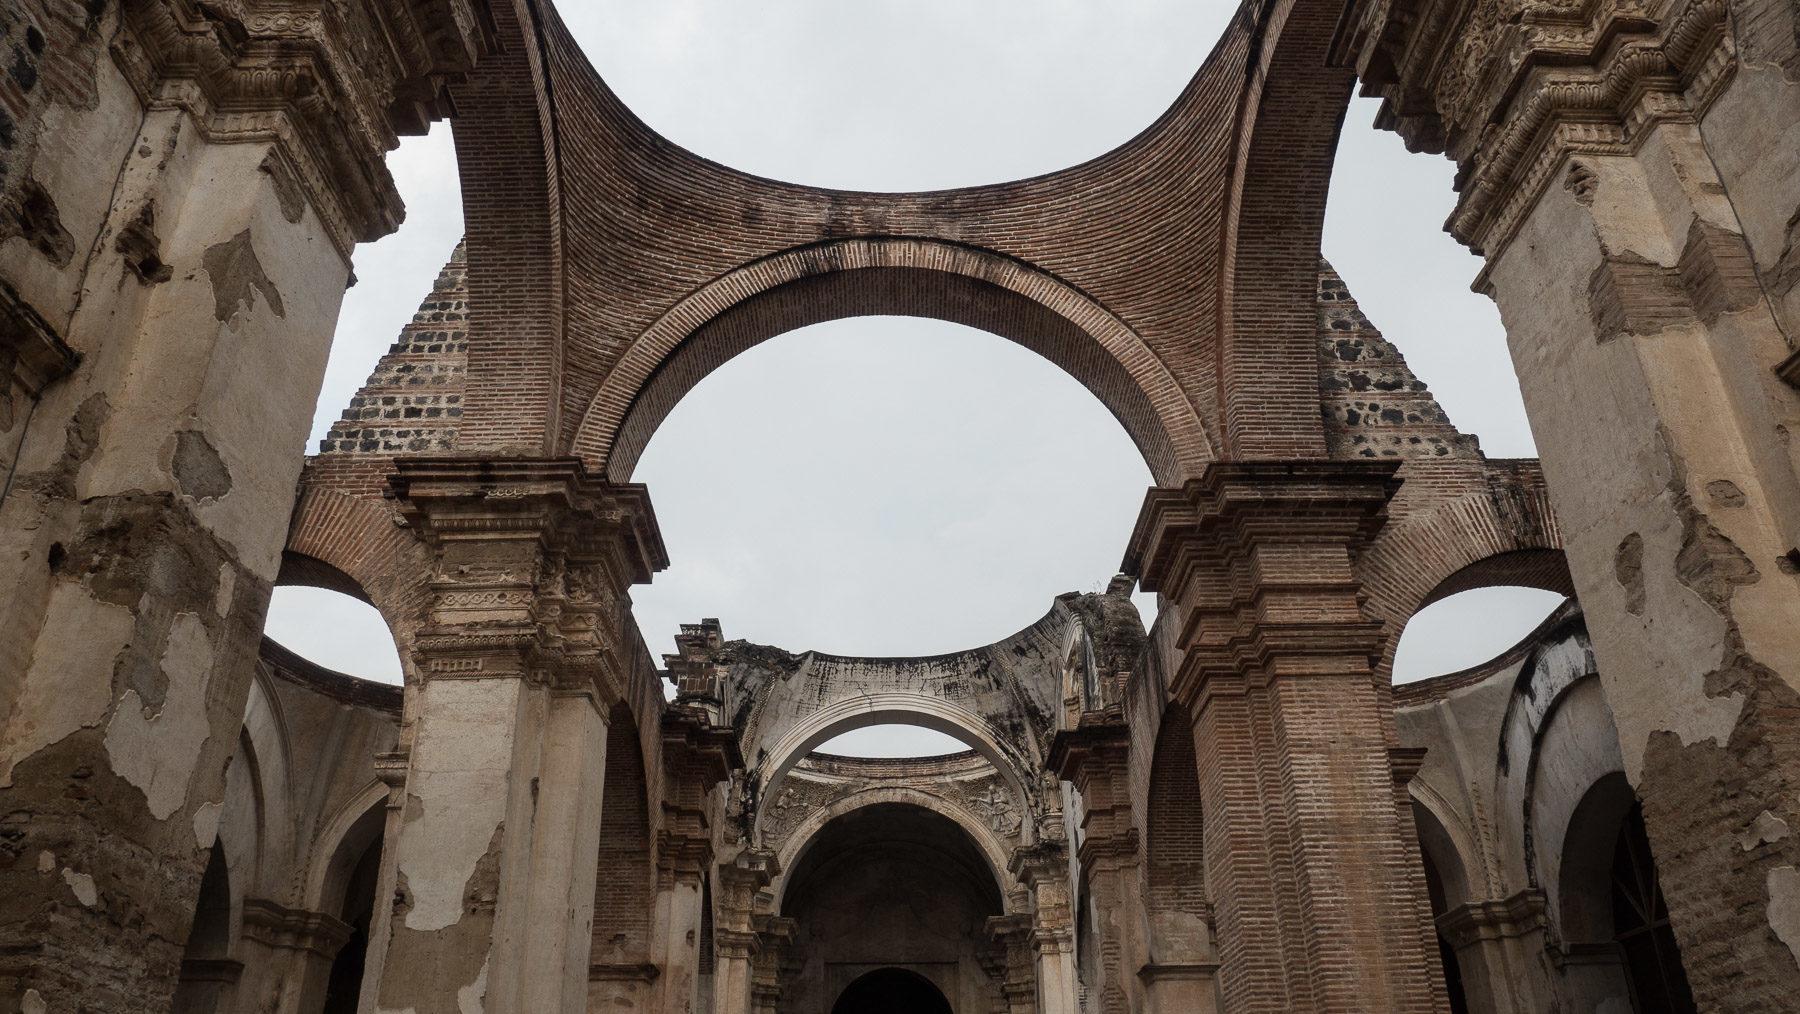 Die Ruine der Kathedrale San Josè